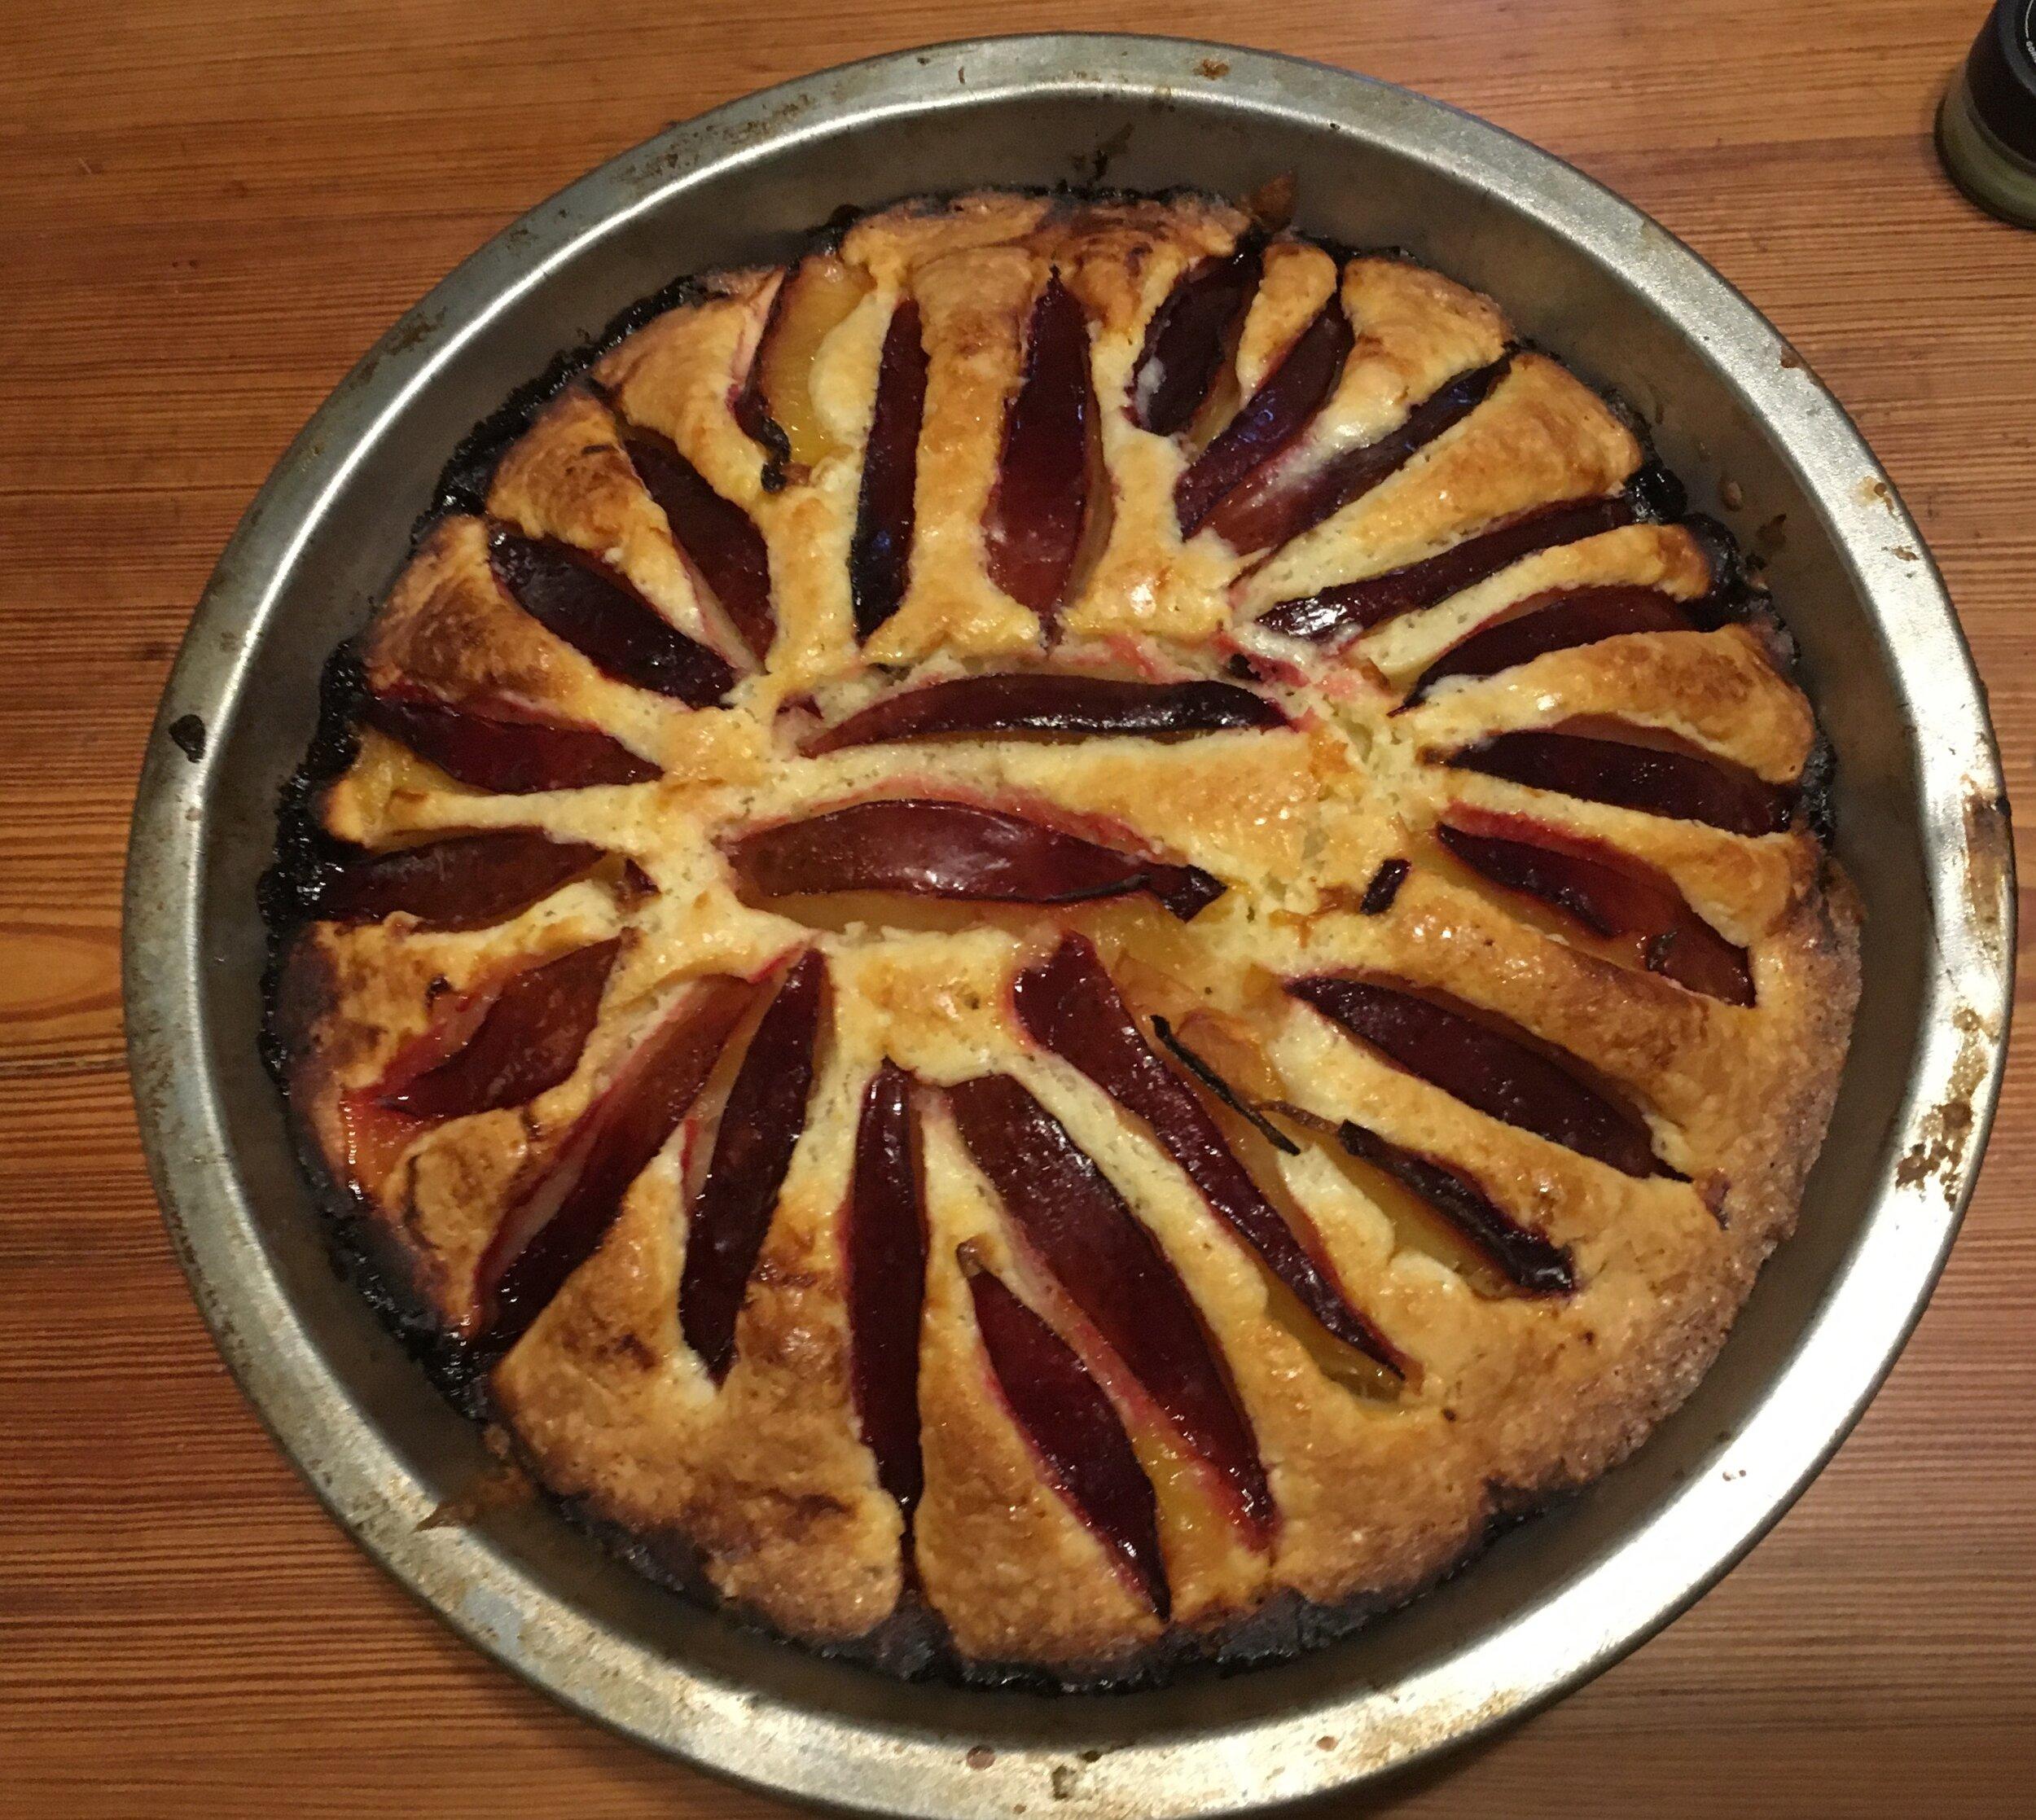 Marian Burros plum torte, a new way!